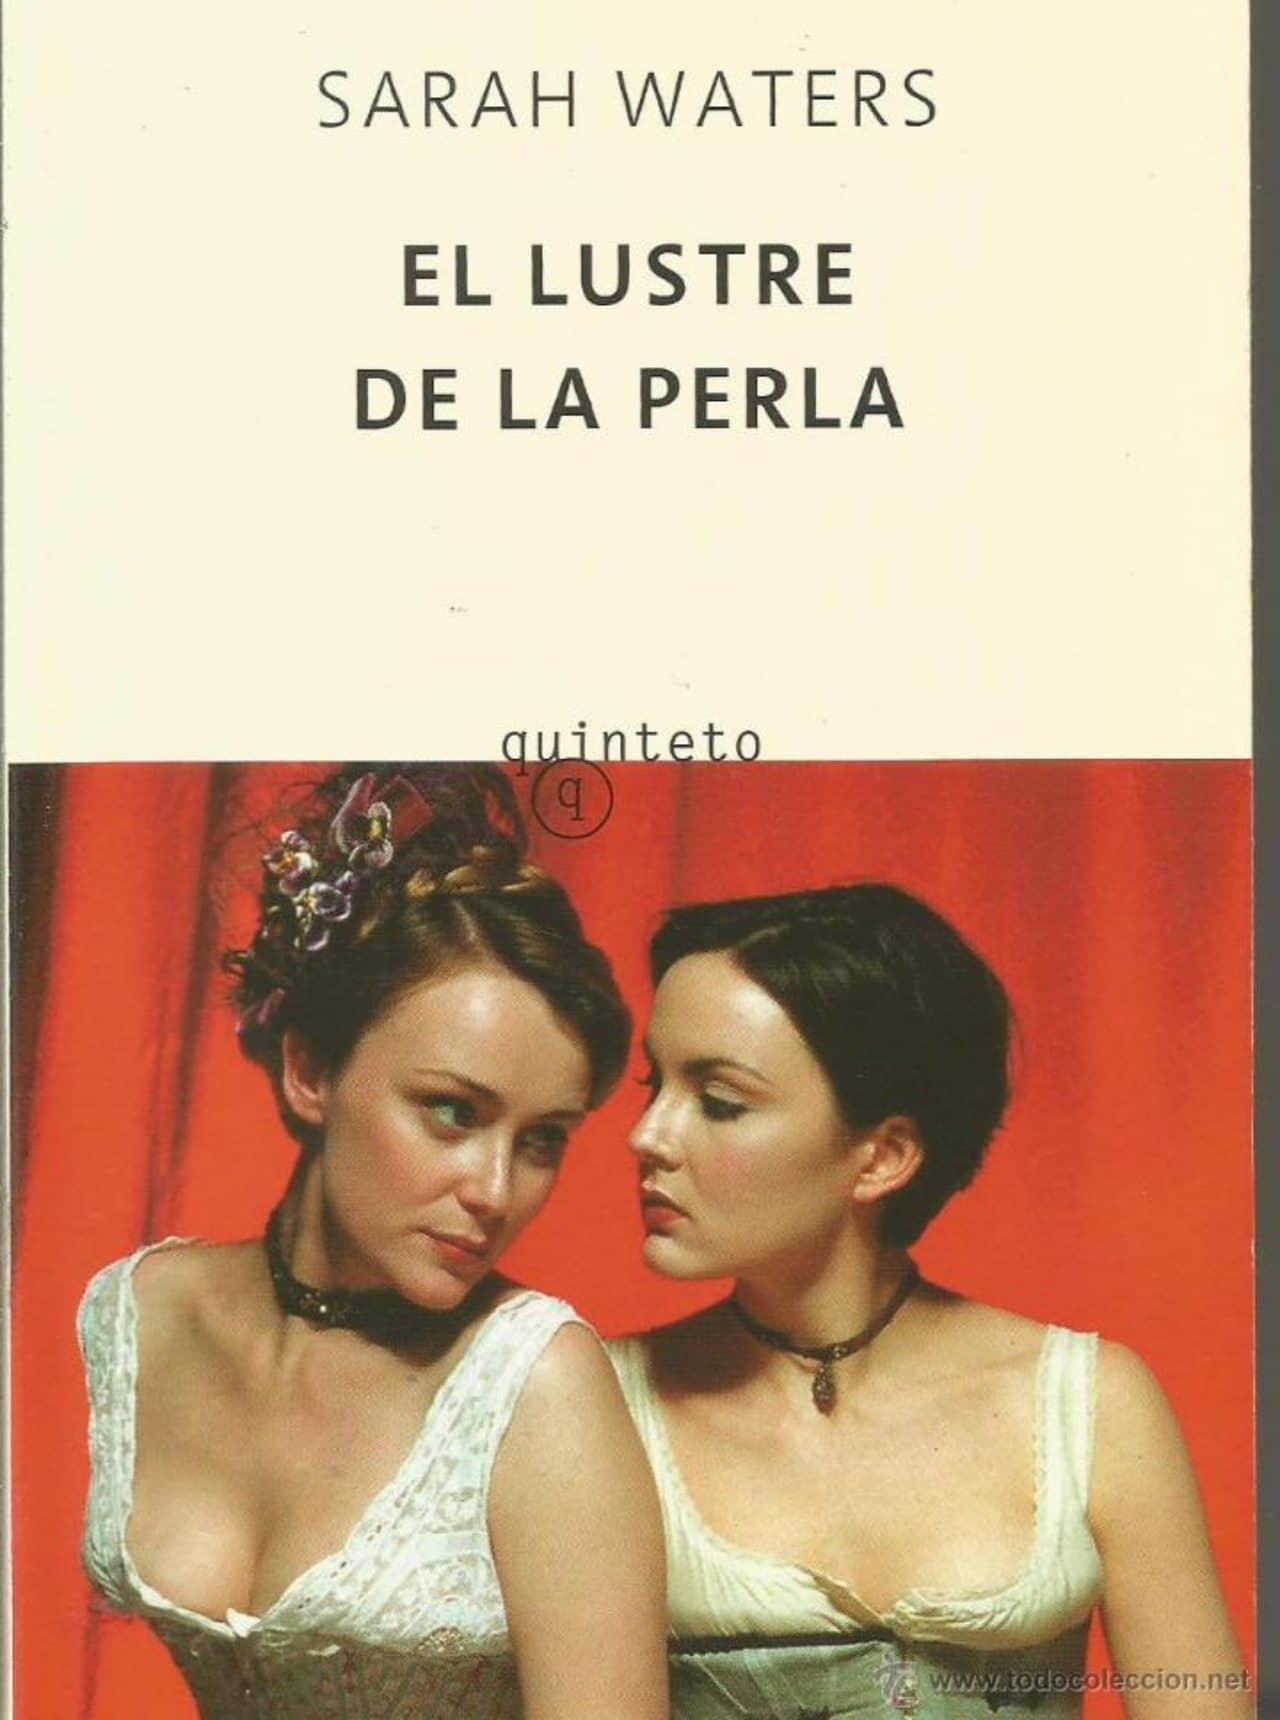 El lustre de la perla Libros LGBT